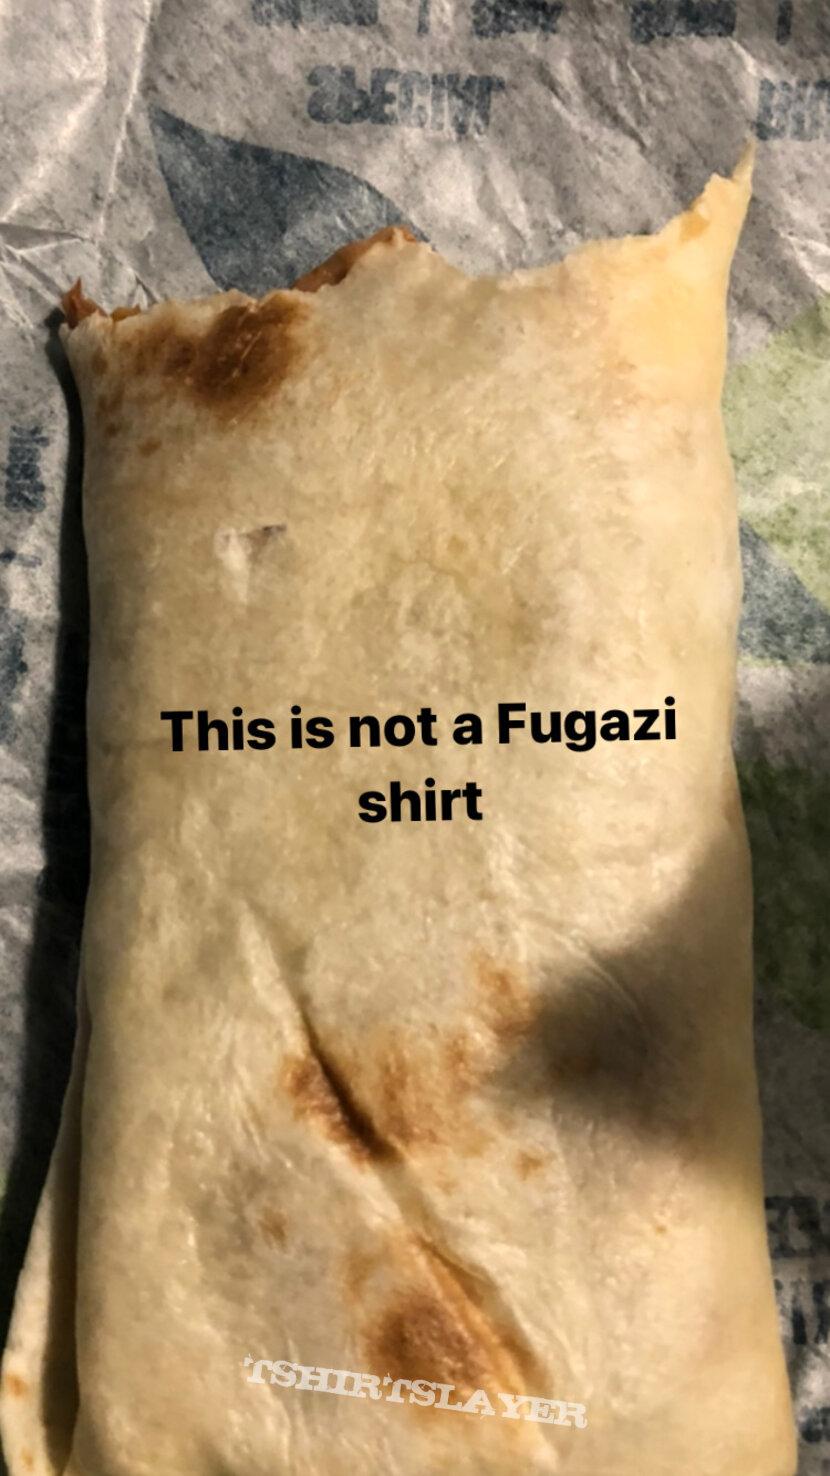 Fugazi shirt